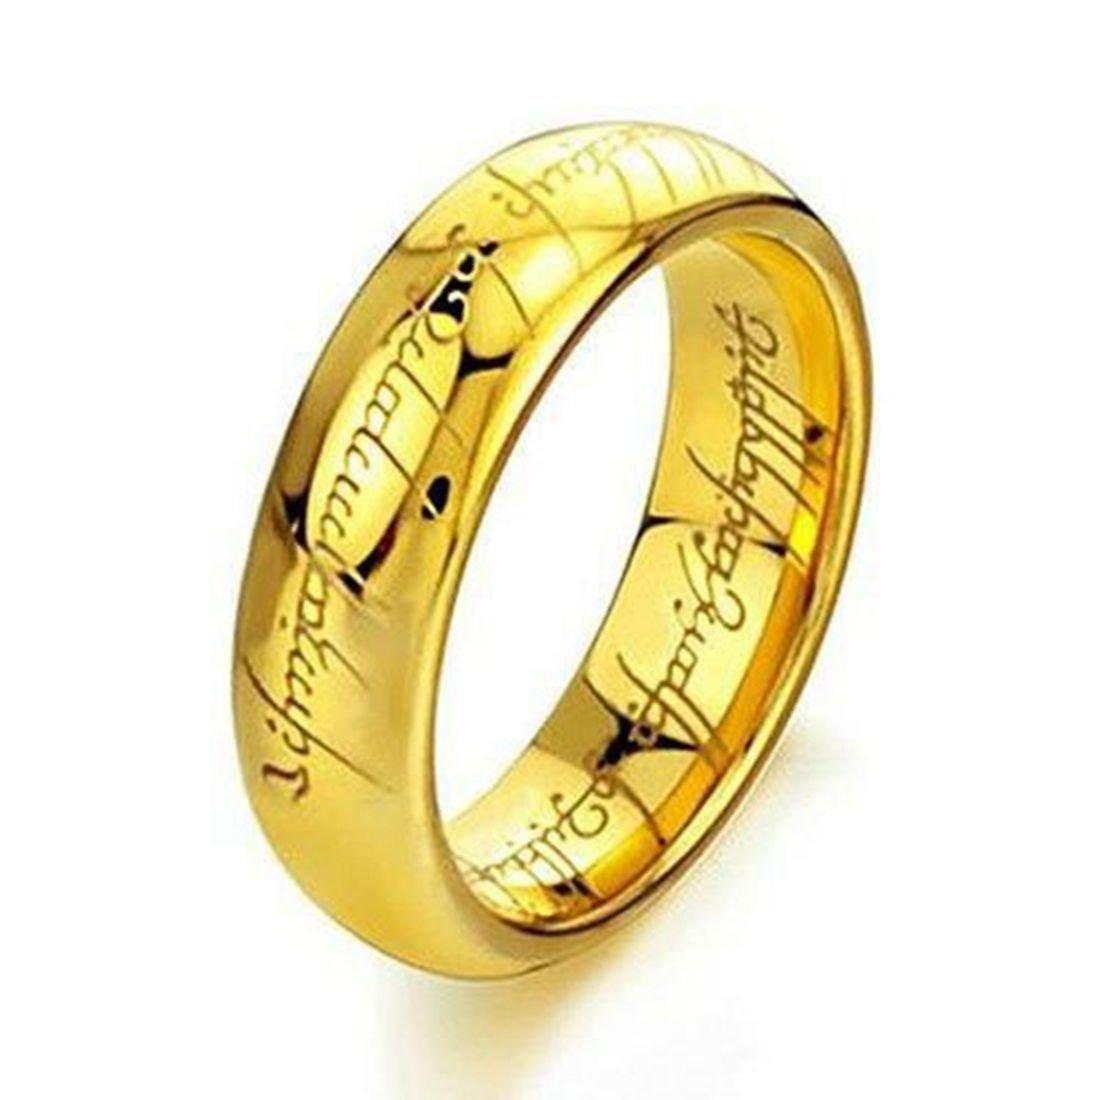 Elove Jewelry Tungsten Steel Lord Rings